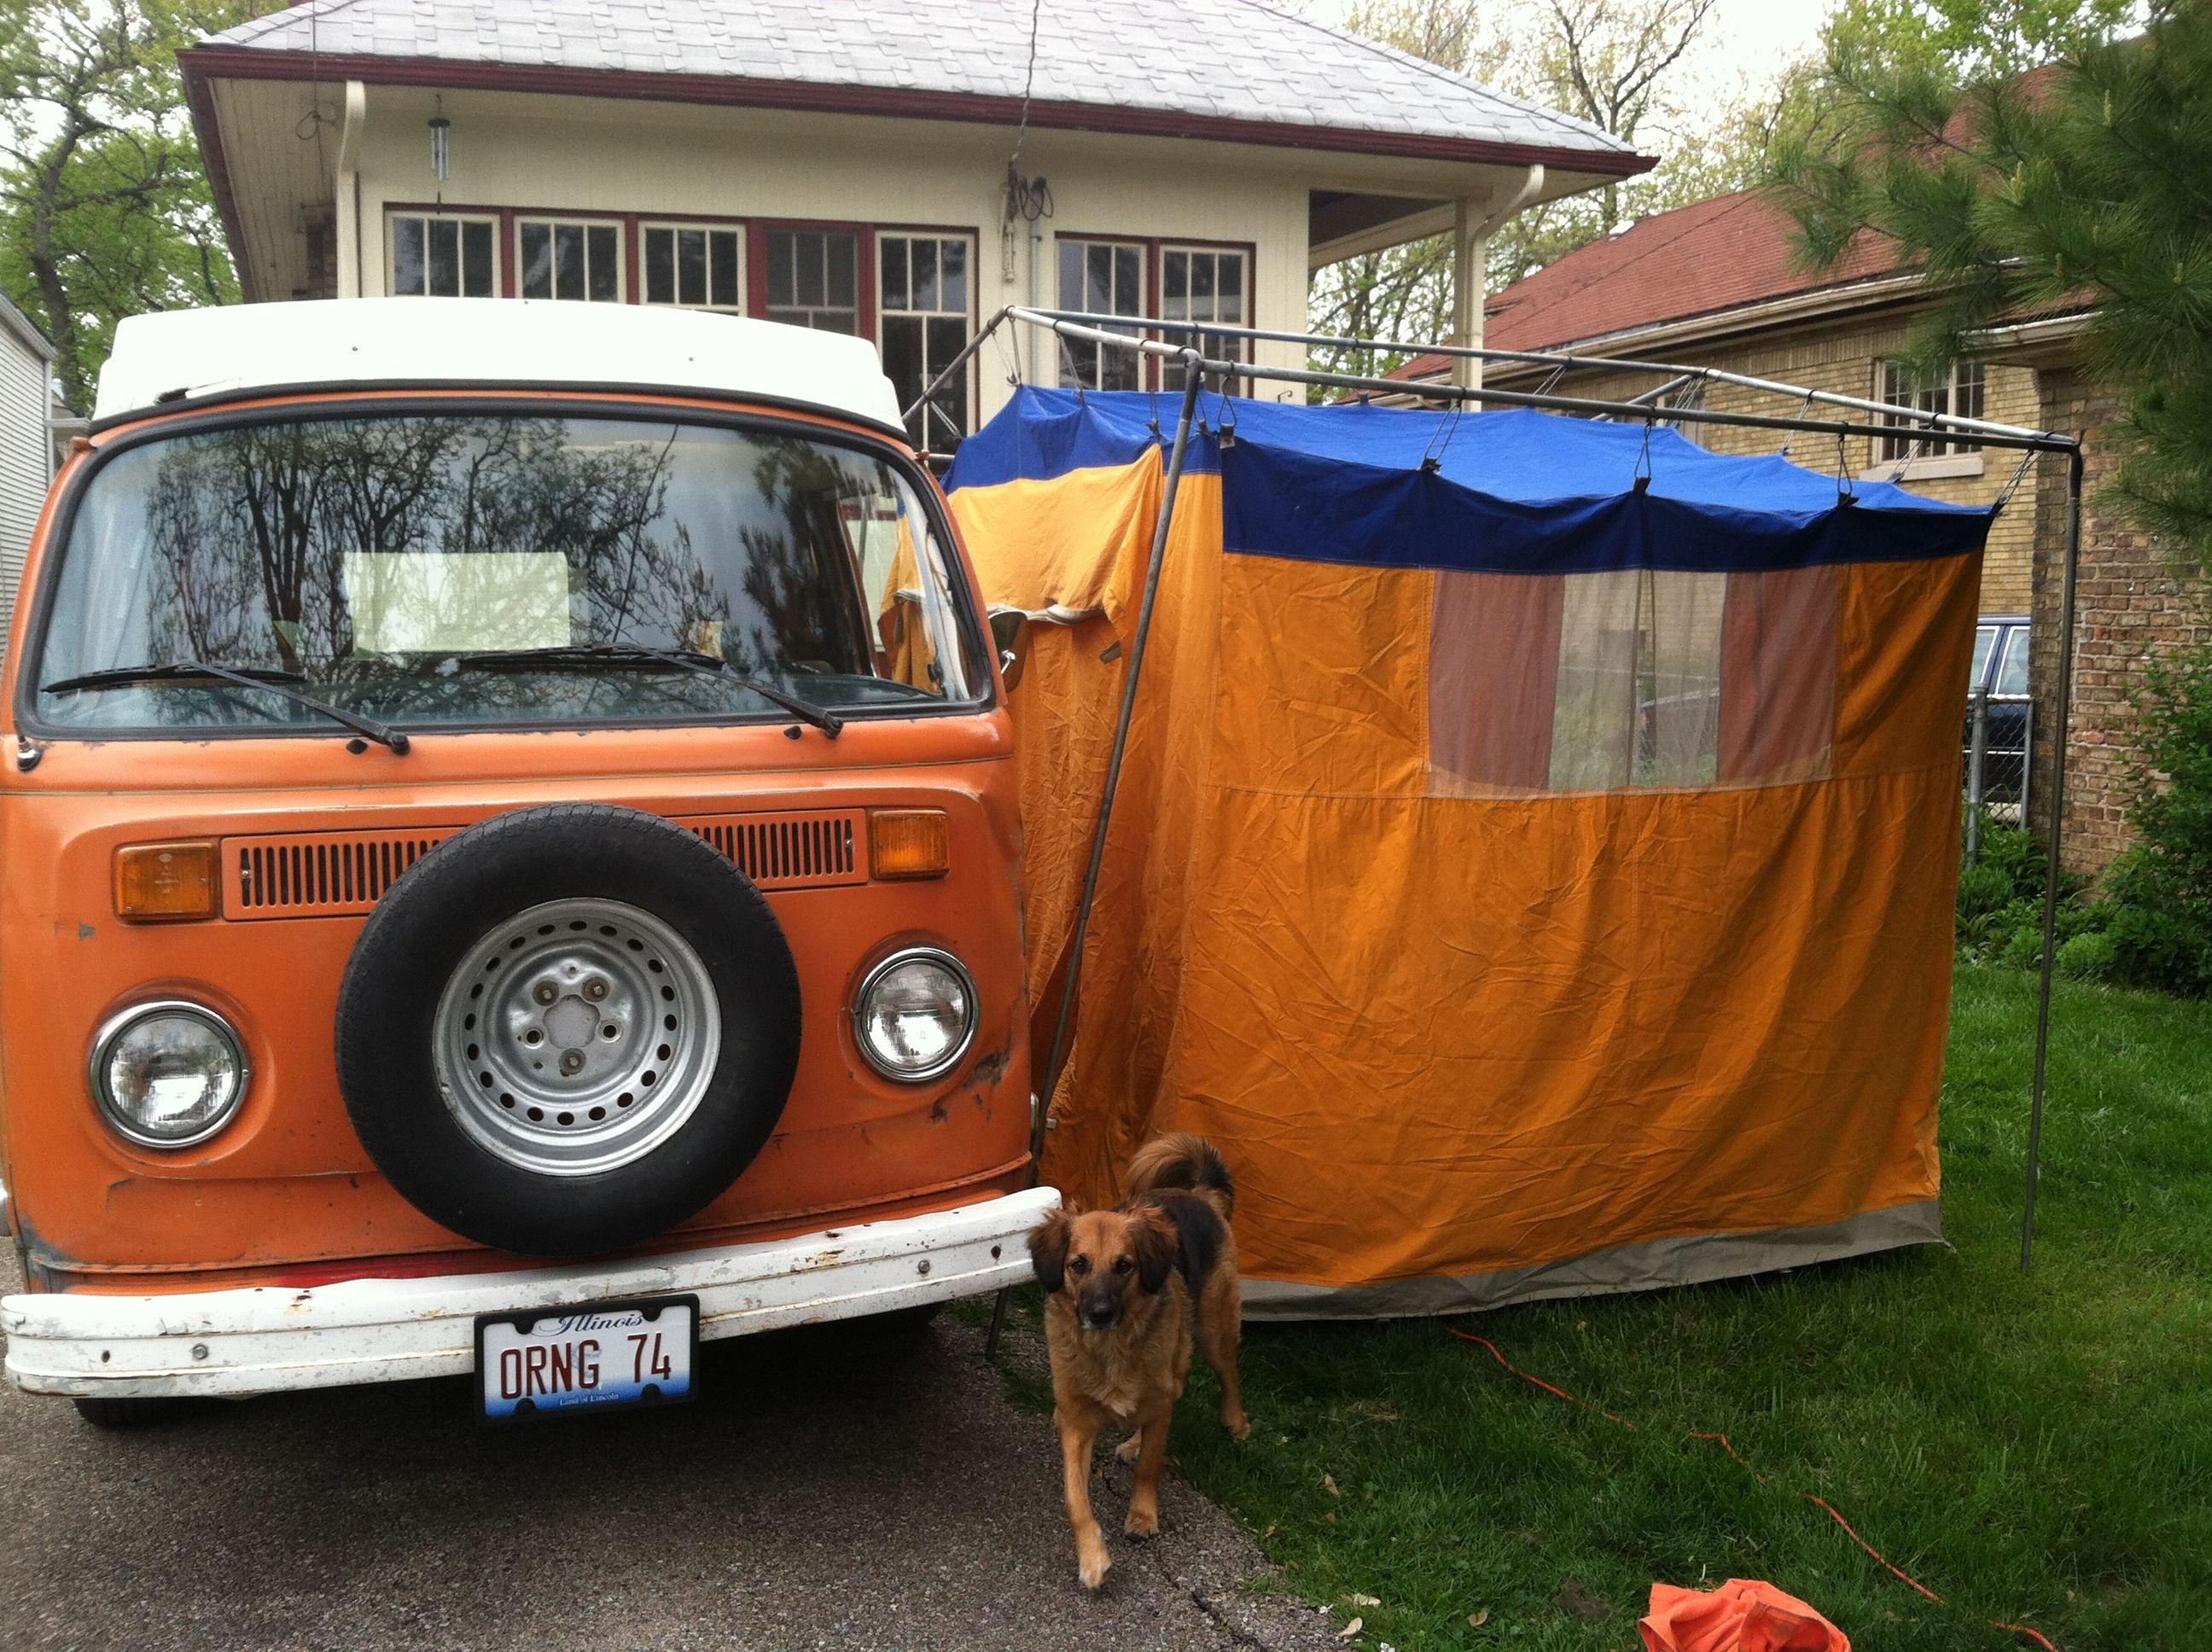 Side tent for 1974 VW bus & Side tent for 1974 VW bus | VW Bus | Pinterest | Vw bus Vw and Vw ...